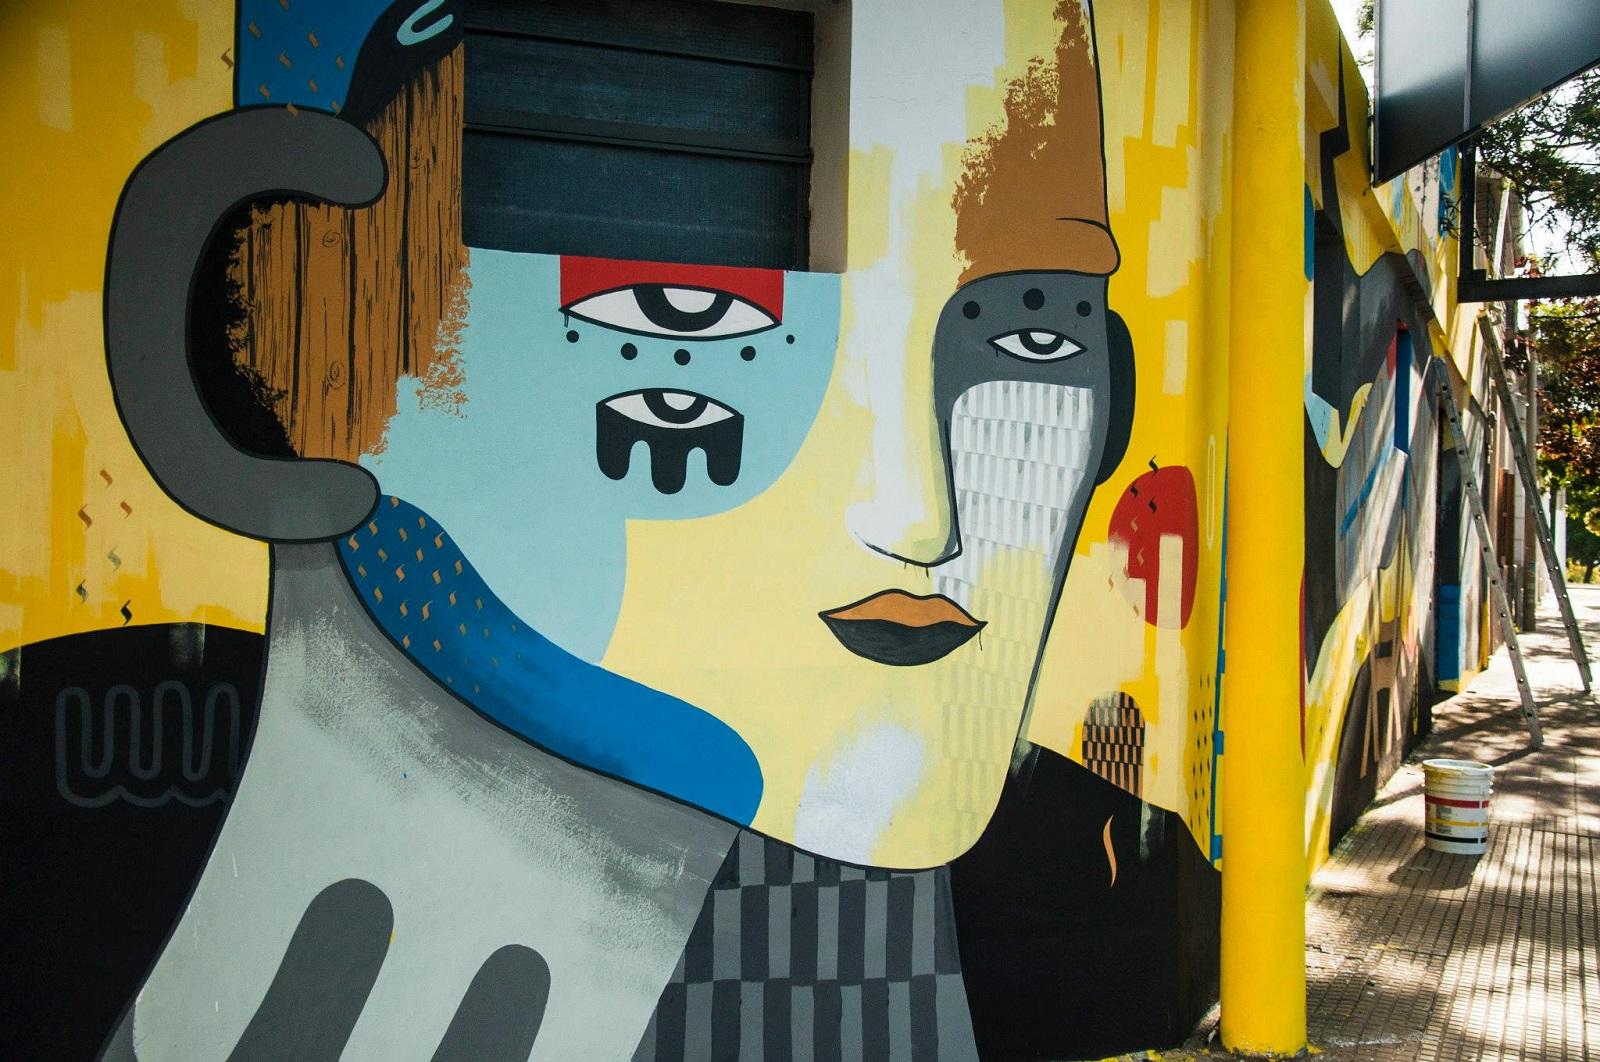 pedro-perelman-new-mural-for-oficio-residence-05